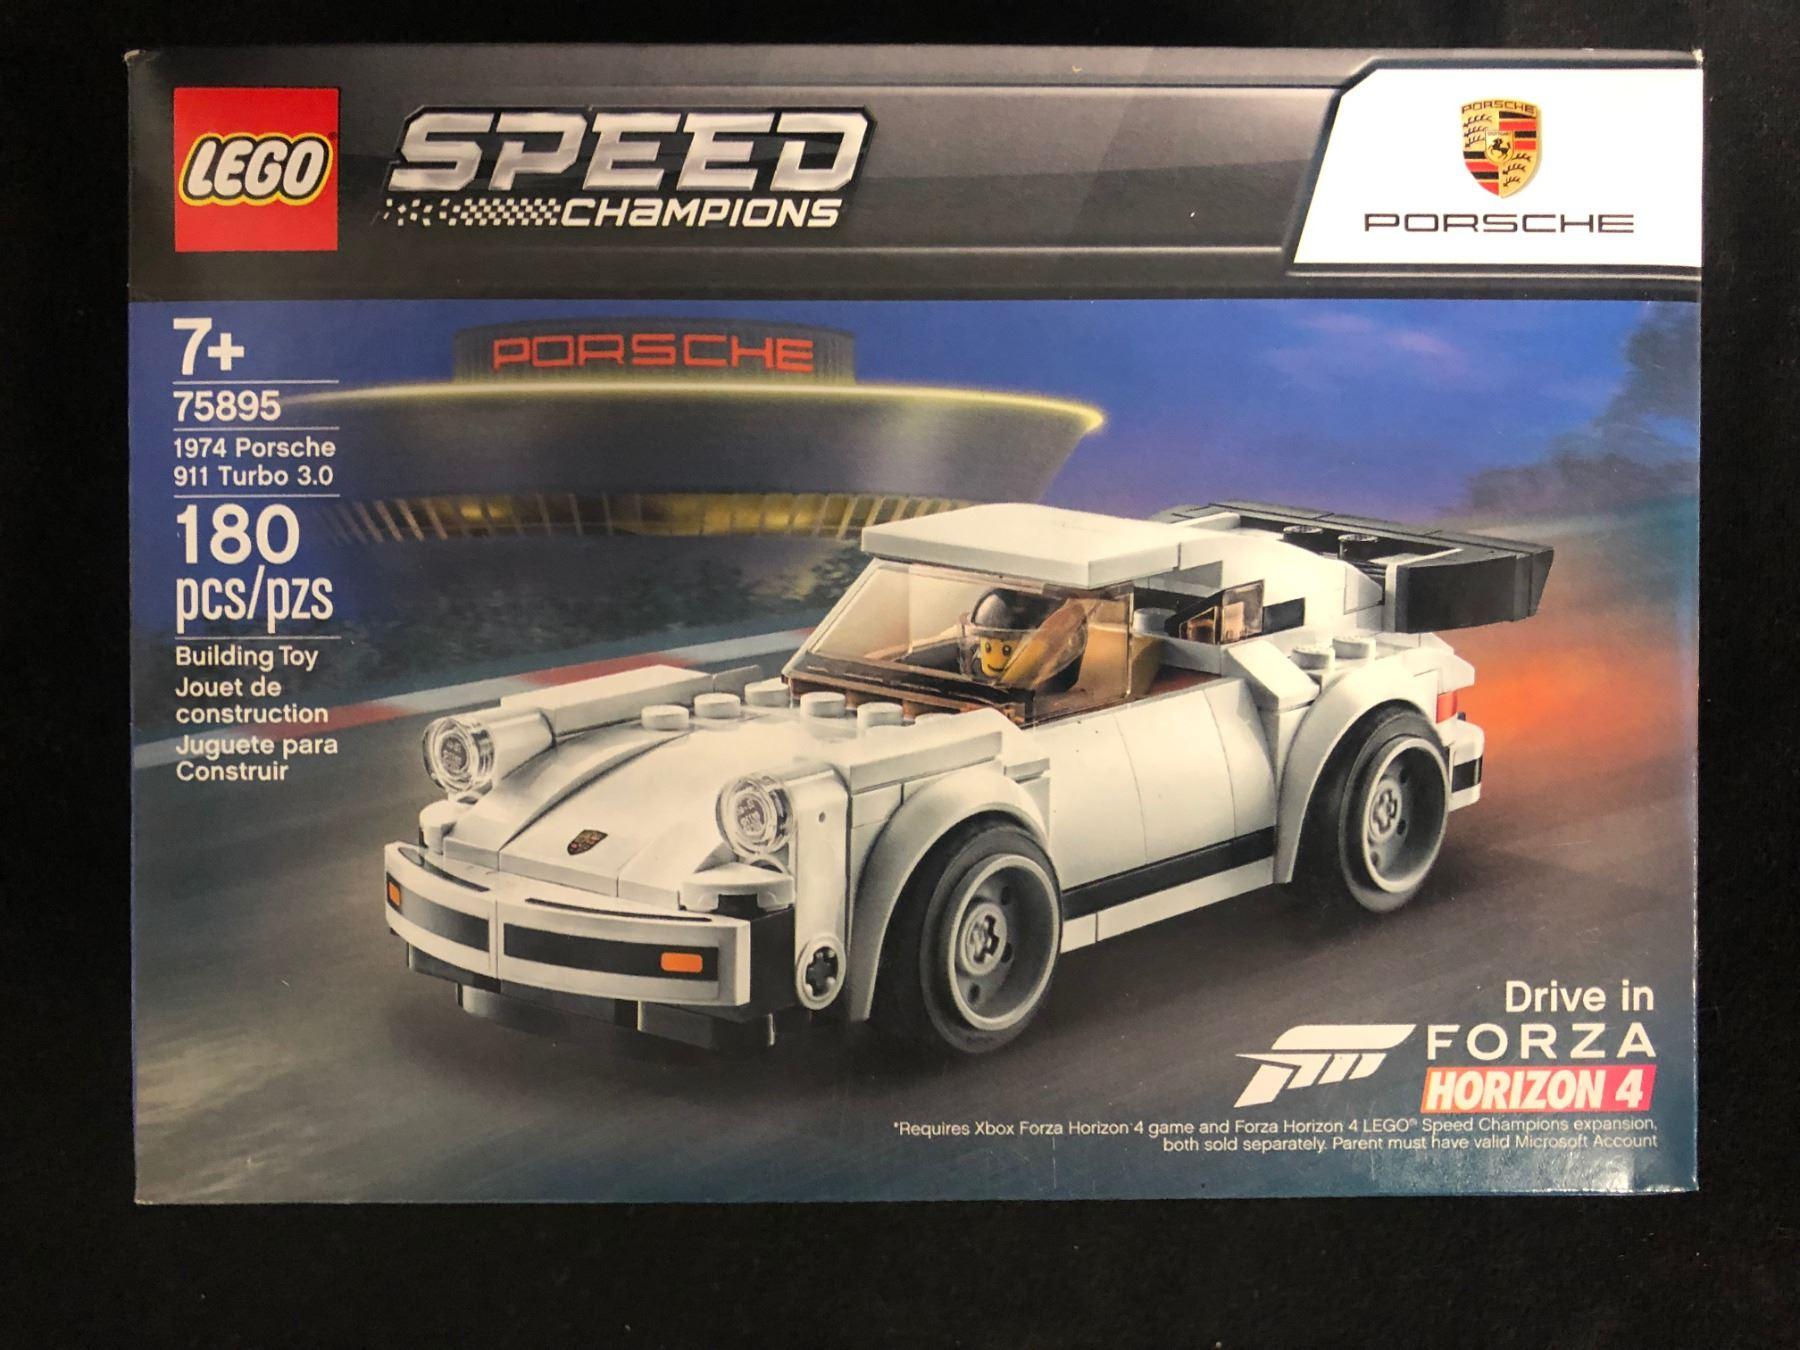 1974 Porsche 911 Turbo 3.0 Lego 75895 Speed Champions